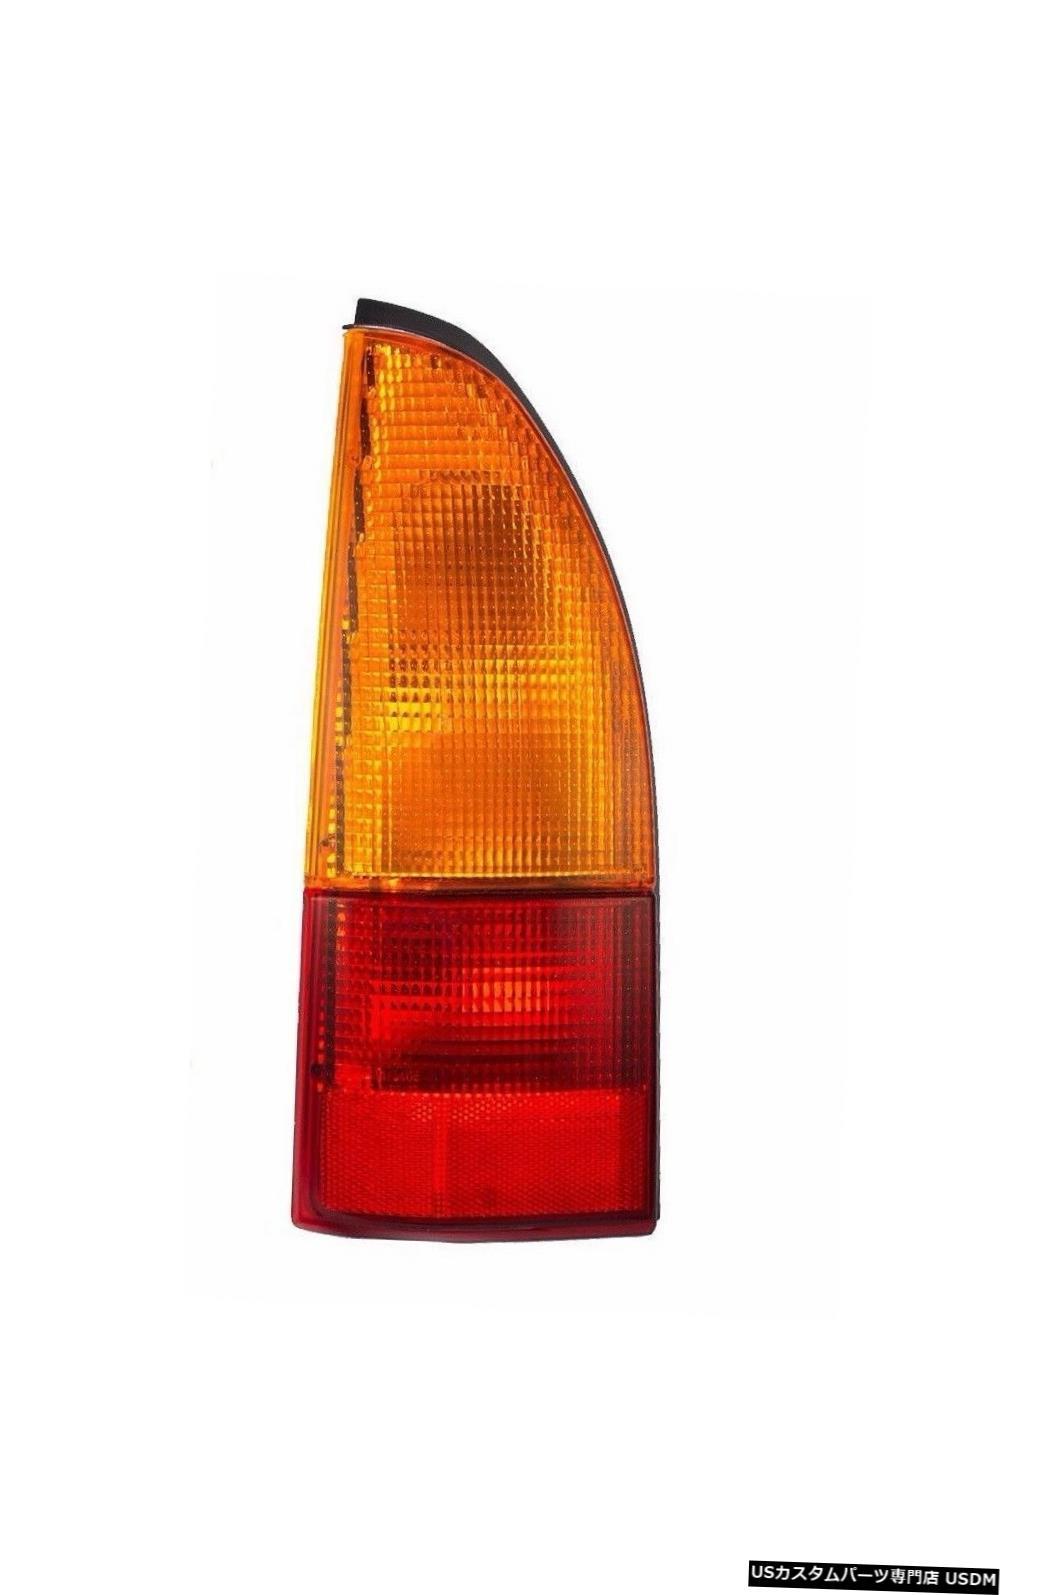 Tail light フリートウッドディスカバリー2003 2004 2005アッパー左ドライバーテールランプテールライトRV FLEETWOOD DISCOVERY 2003 2004 2005 UPPER LEFT DRIVER TAIL LAMP TAILLIGHT RV